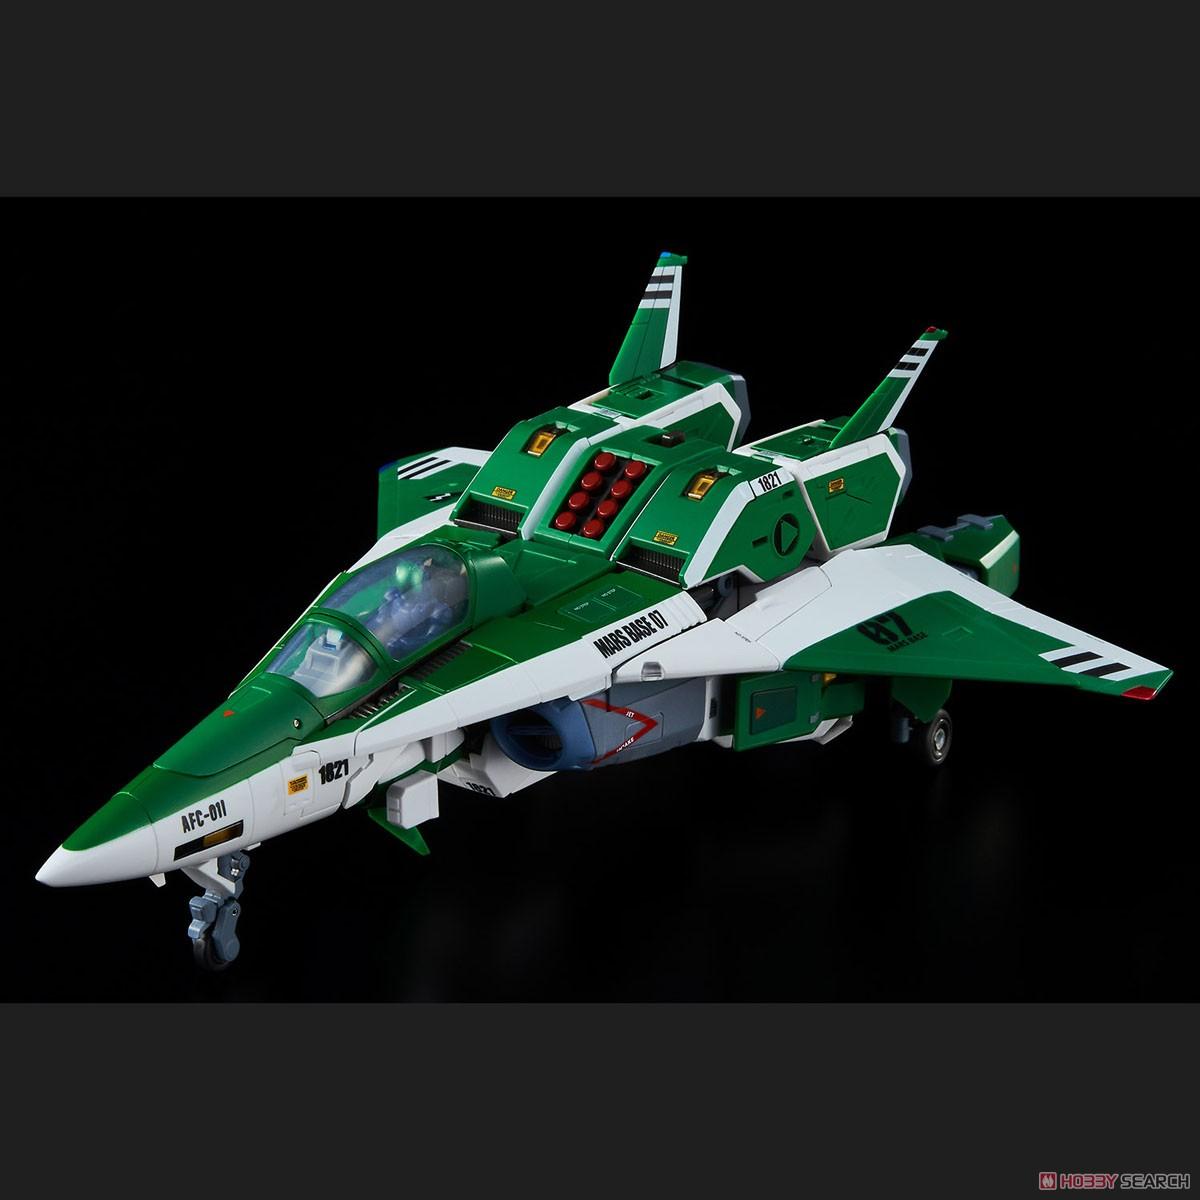 RIOBOT『AFC-01I レギオス・イオタ』機甲創世記モスピーダ 1/48 可変可動フィギュア-016